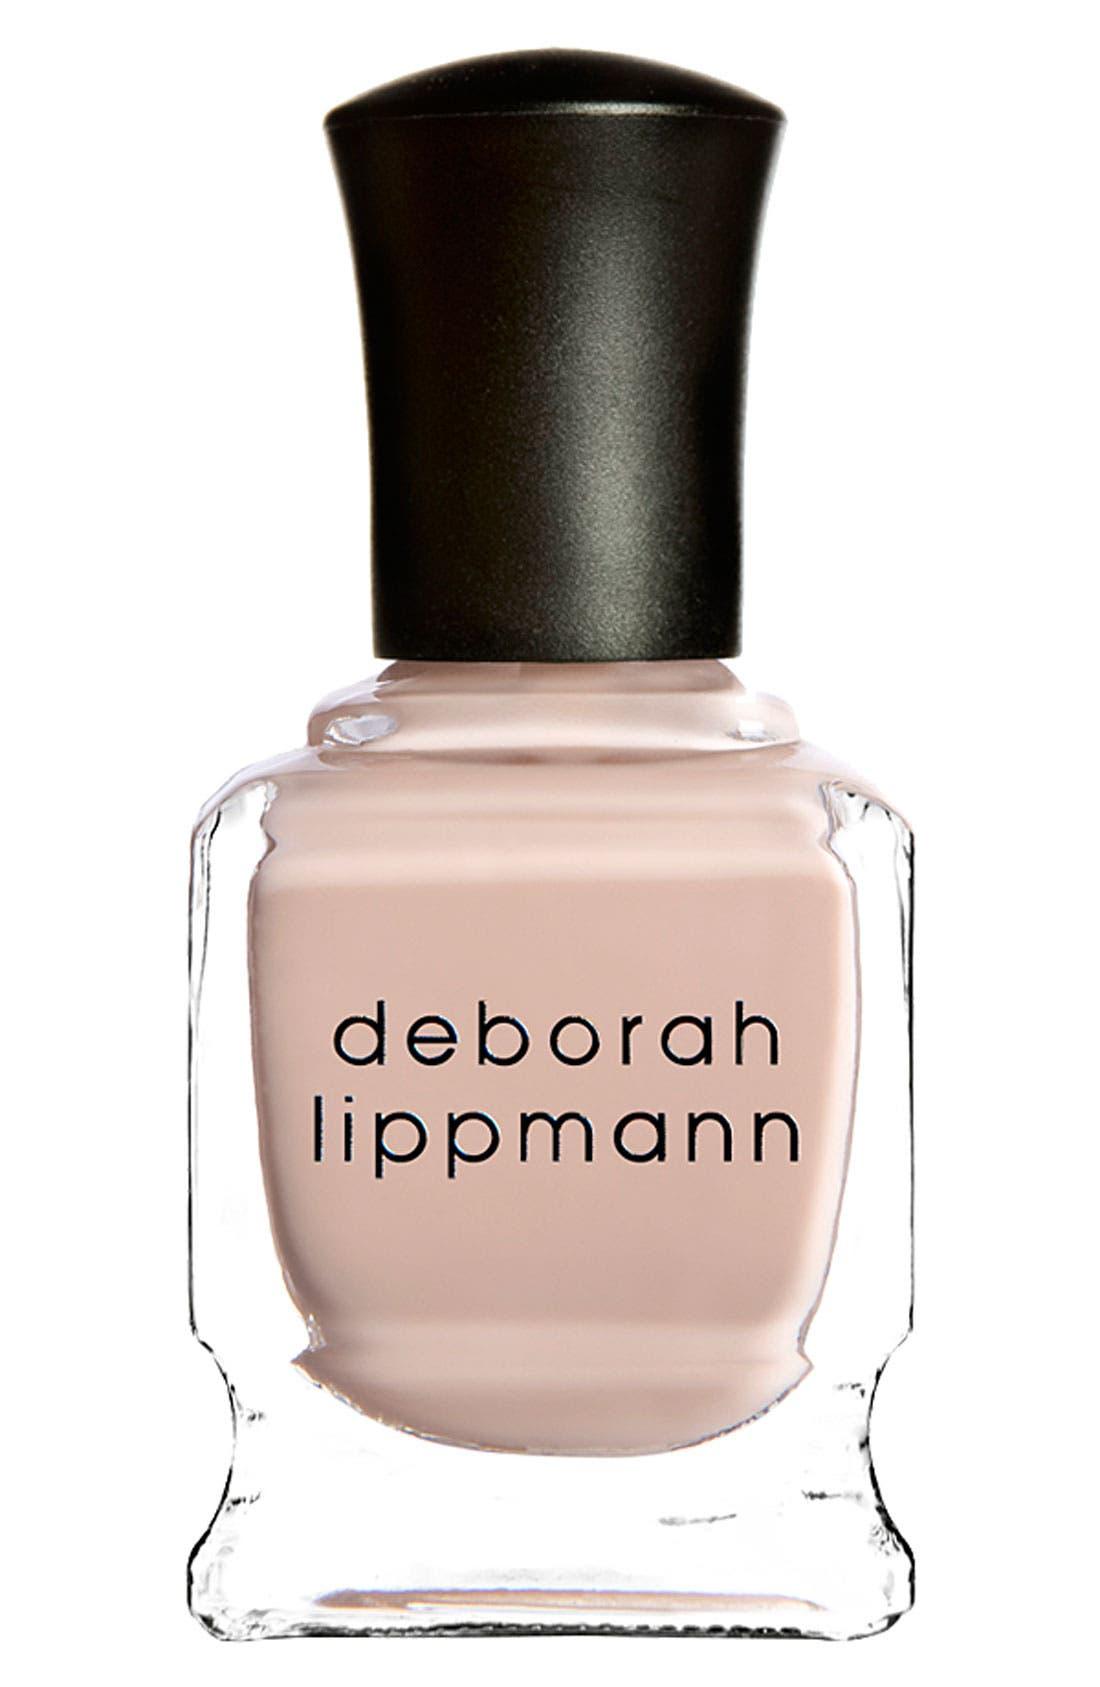 Deborah Lippmann | Nordstrom